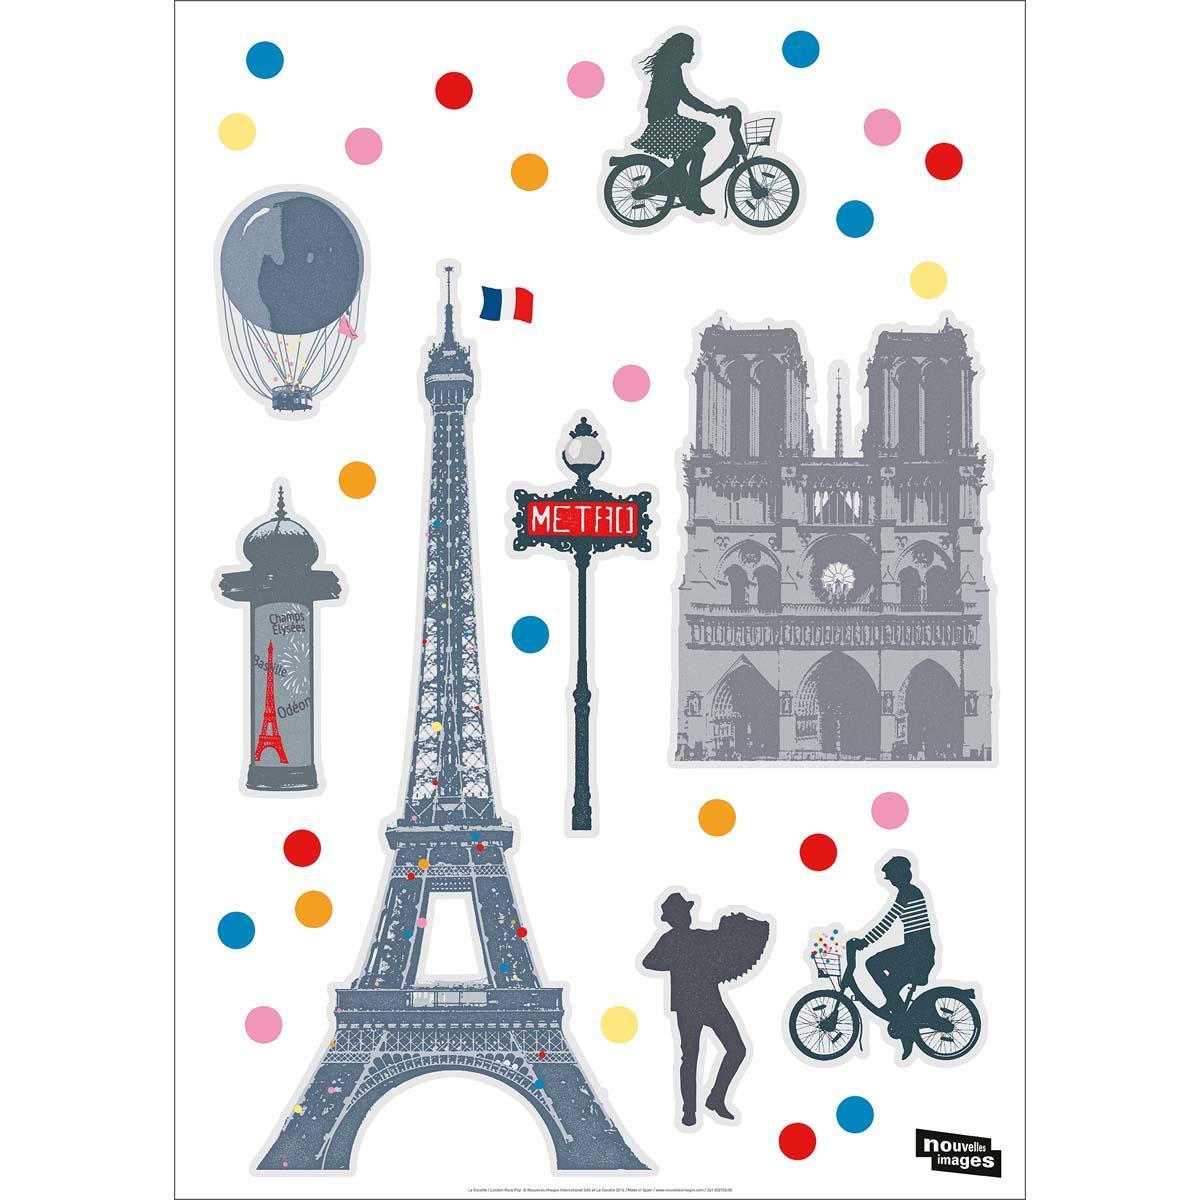 Ref-170-002025-03-5-DRAEGER-Lot-de-5-Stickers-mural-Paris-Multicolore miniature 3